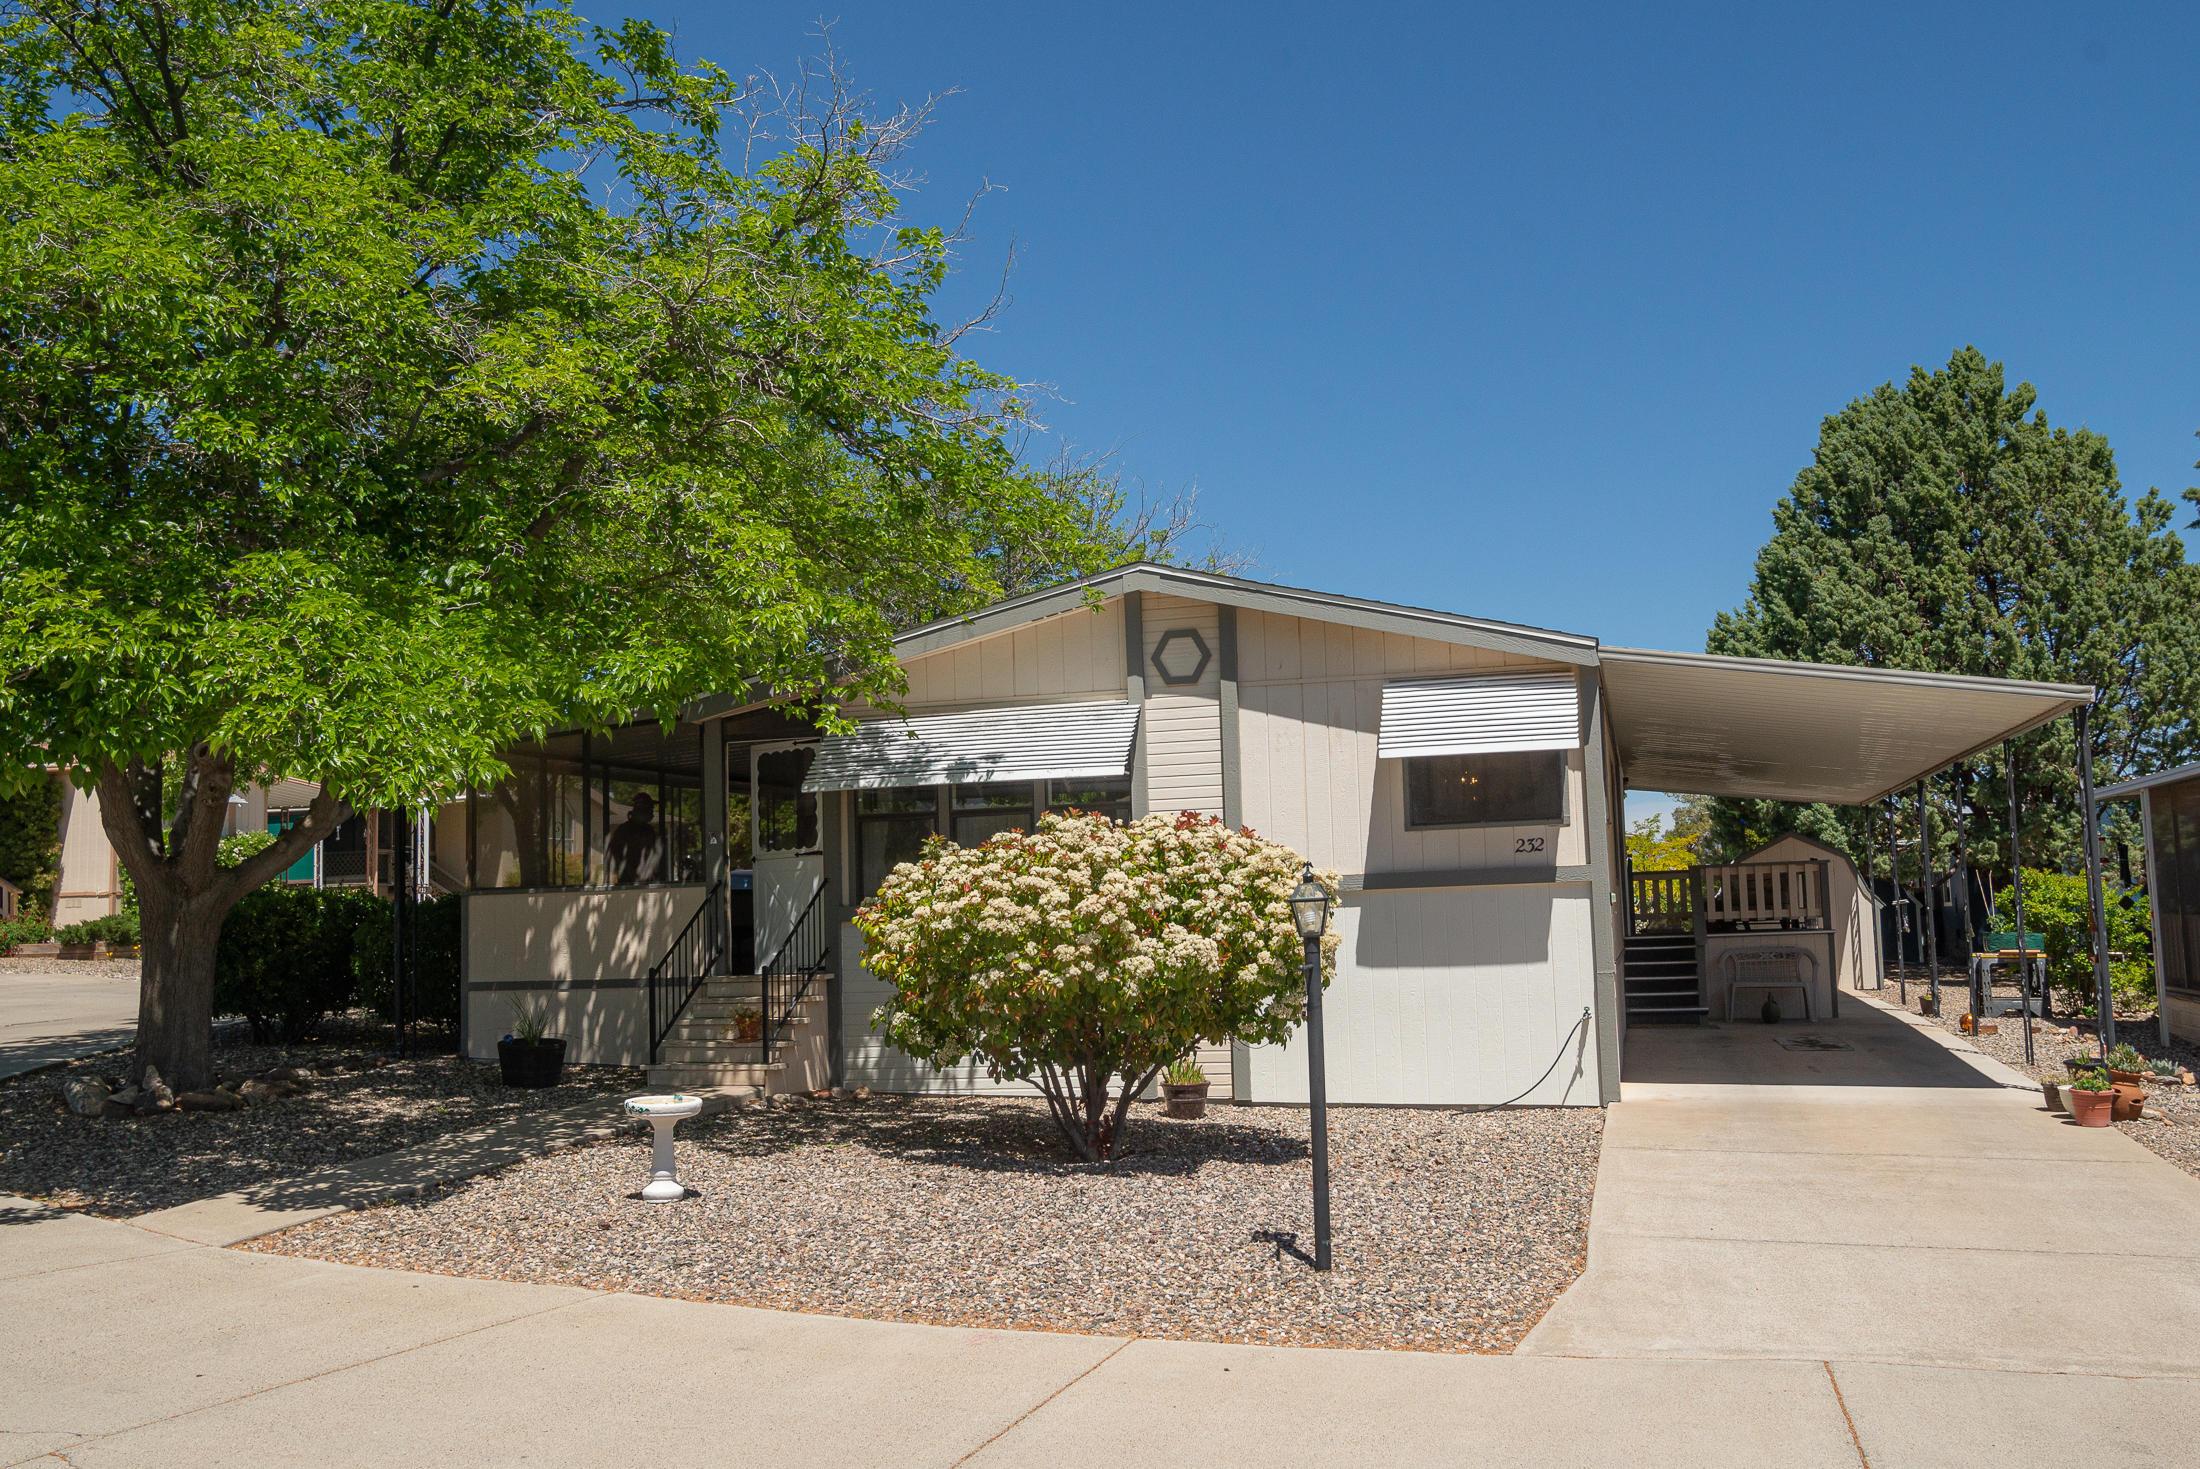 232 Lampliter Clarkdale, AZ 86324